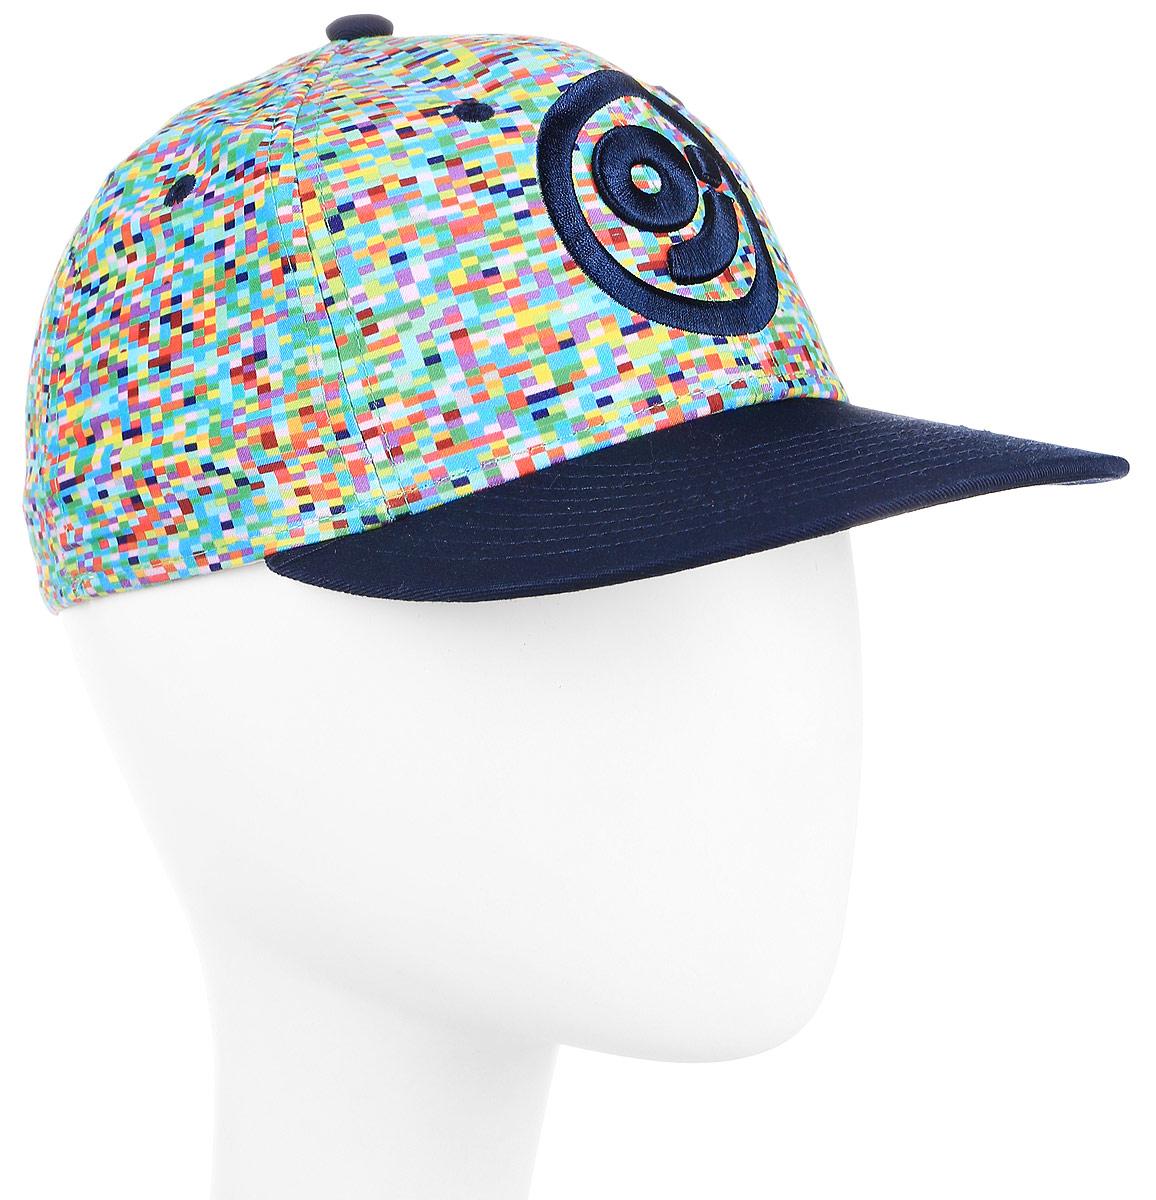 Бейсболка Imojo, цвет: темно-синий. BY151019. Размер 56/58BY151019Модная молодежная бейсболка из плотного хлопка